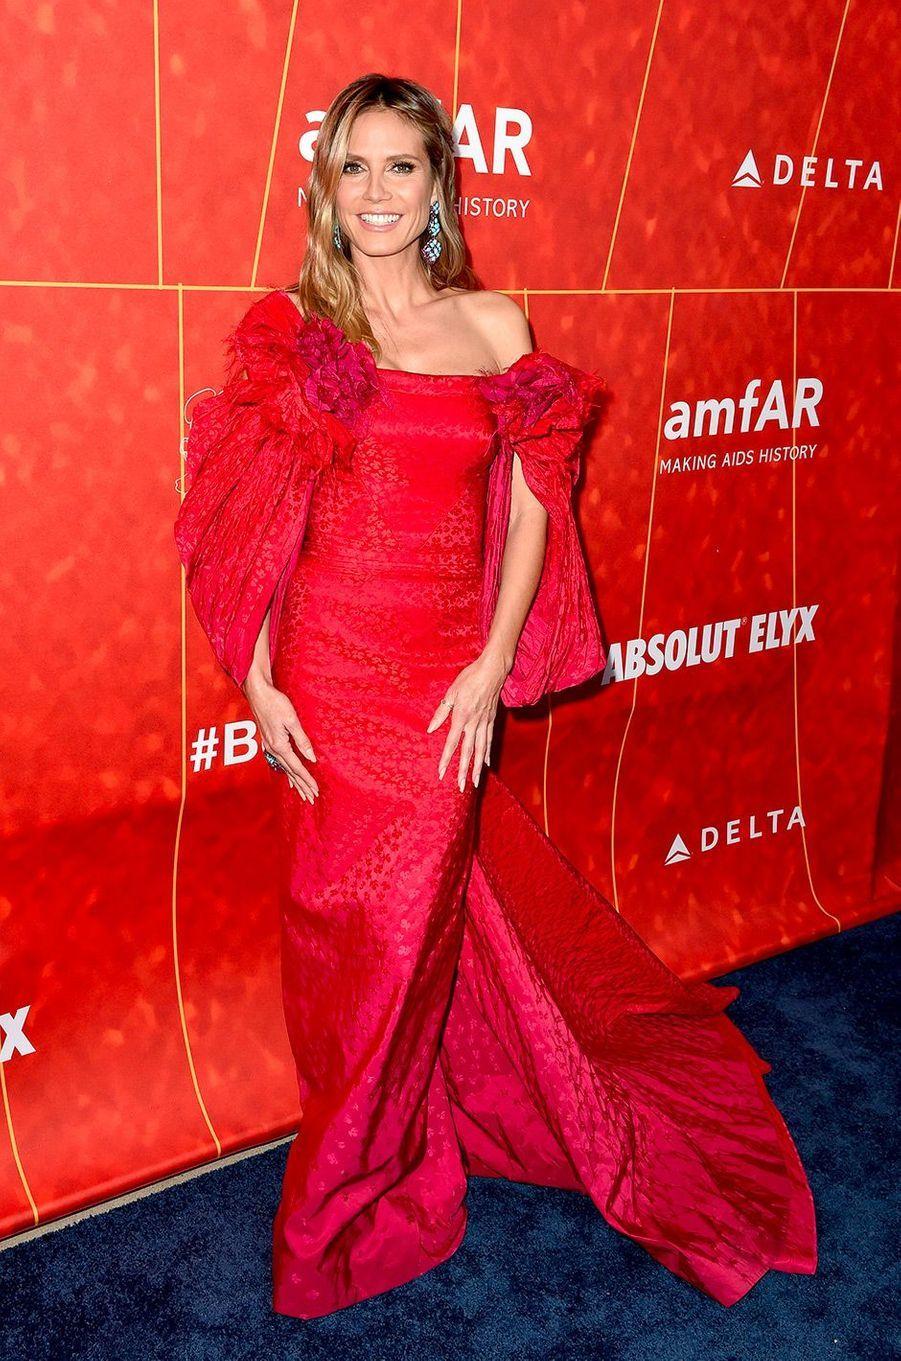 Heidi Klum au gala de l'amfAR, jeudi 18 octobre